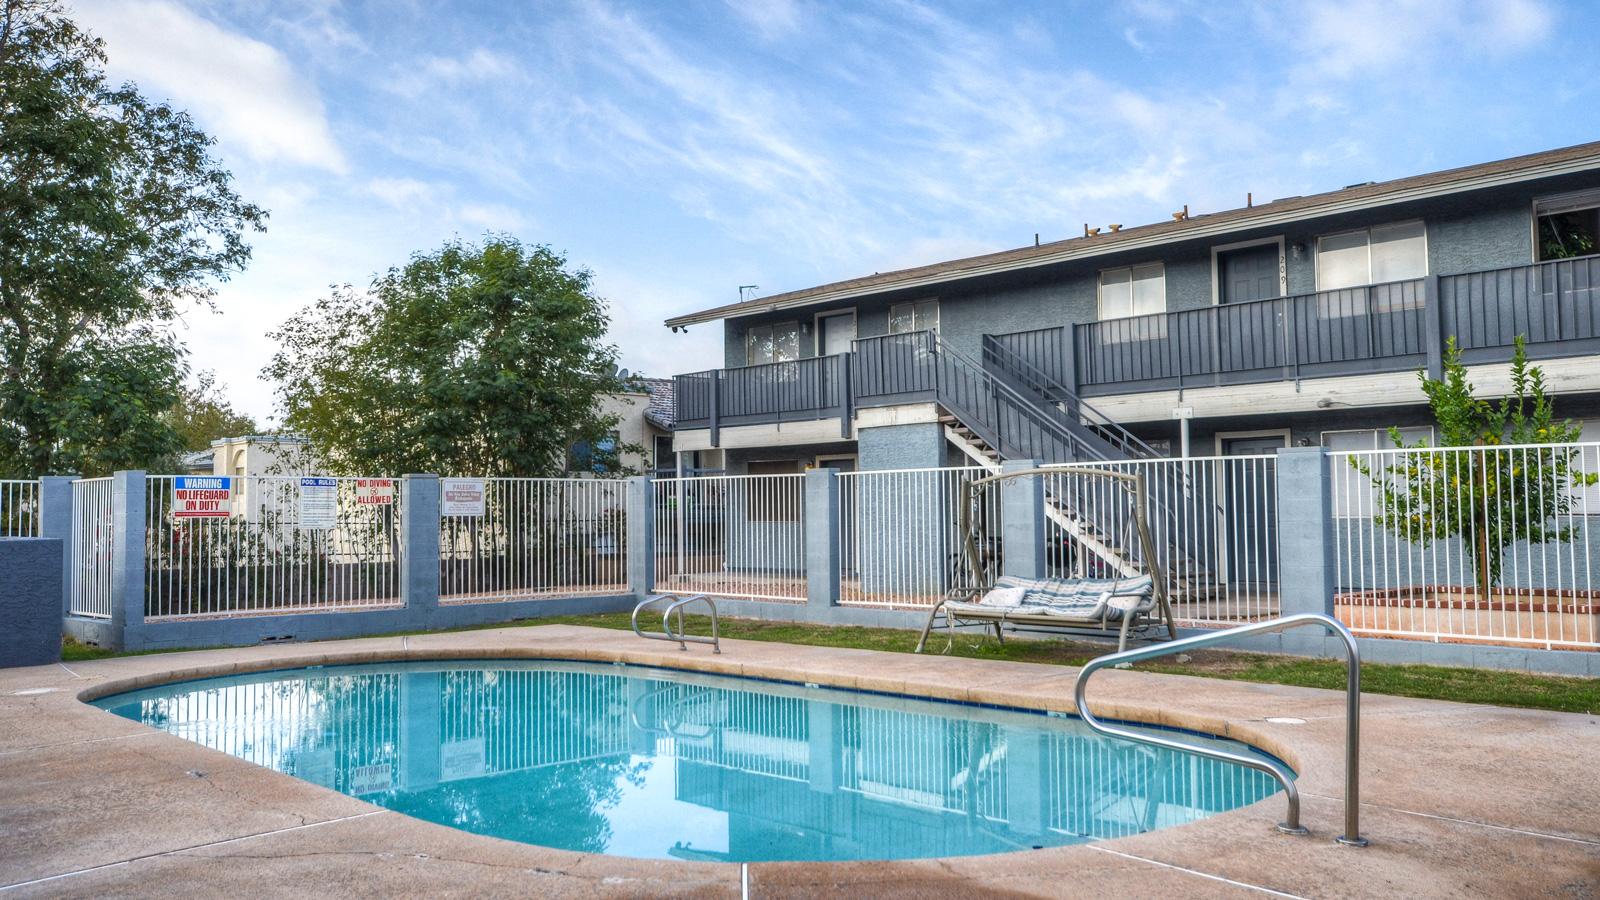 Desert Cove Manor | 1535 West Desert Cove Avenue, Phoenix, AZ 85029 | 26 Units | Built in 1983 | $1,850,000 | $71,154 Per Unit | $94.12 Per SF